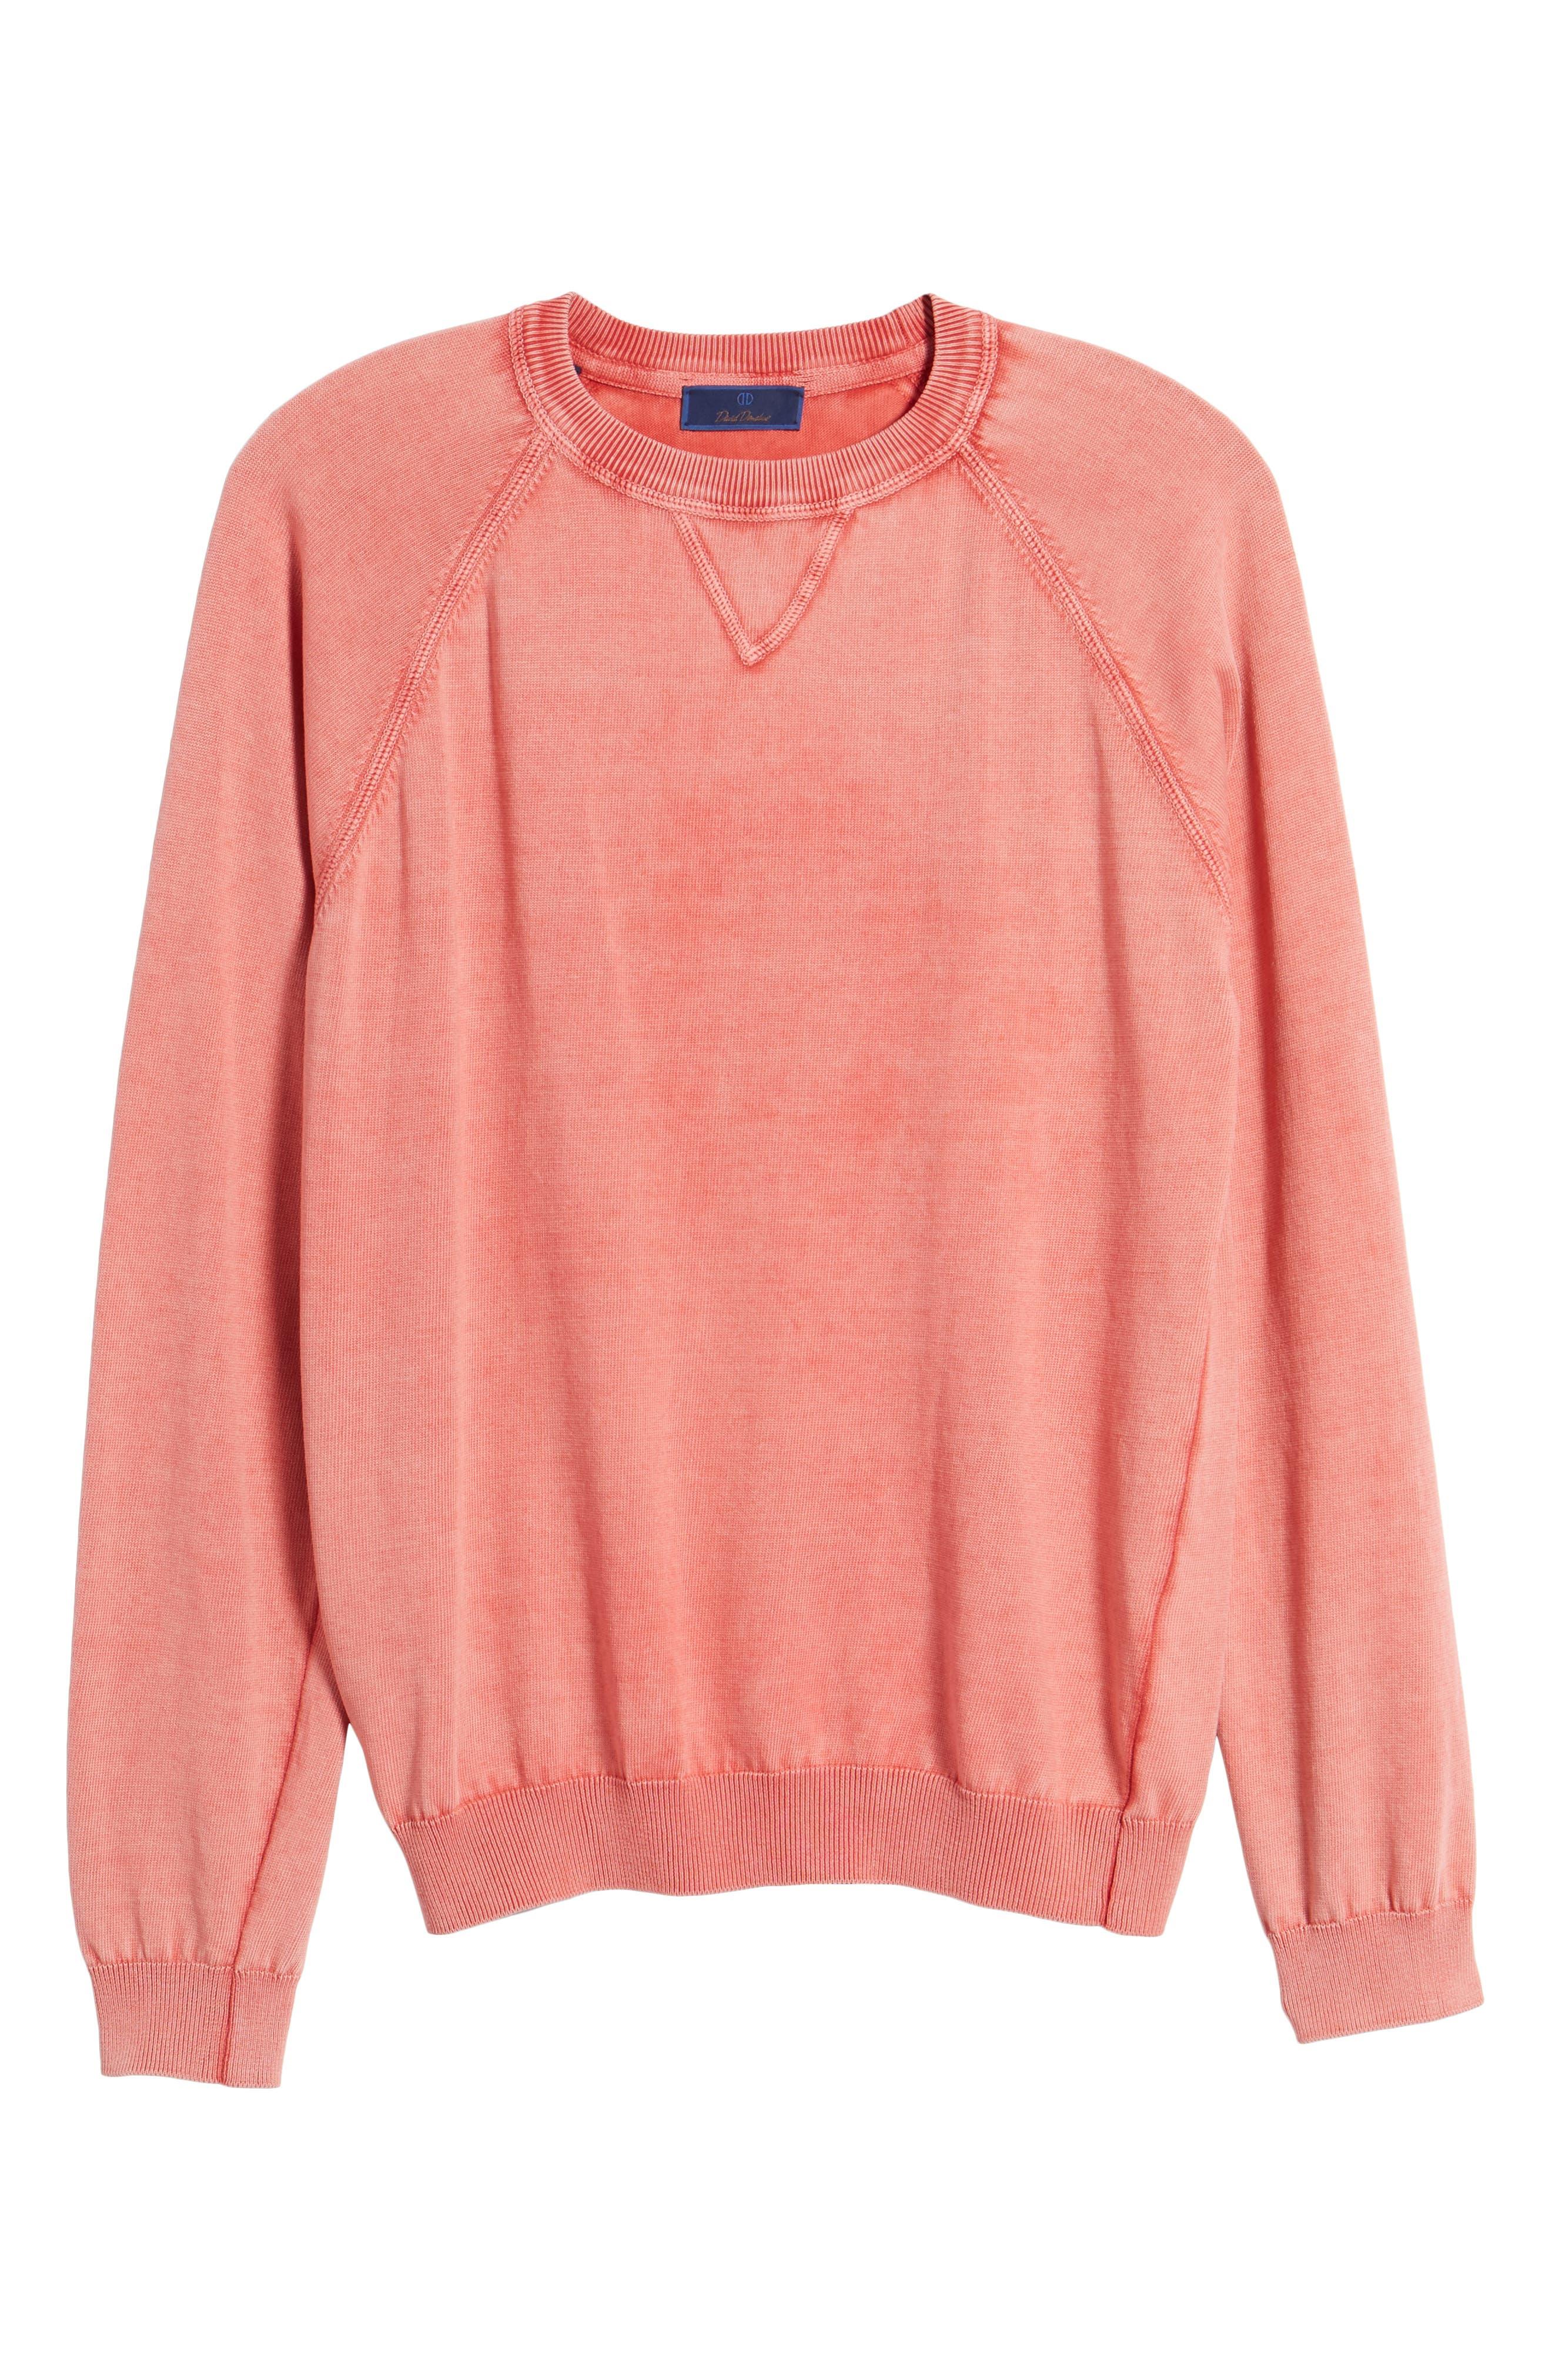 Stonewash Cotton Sweatshirt,                             Alternate thumbnail 6, color,                             842